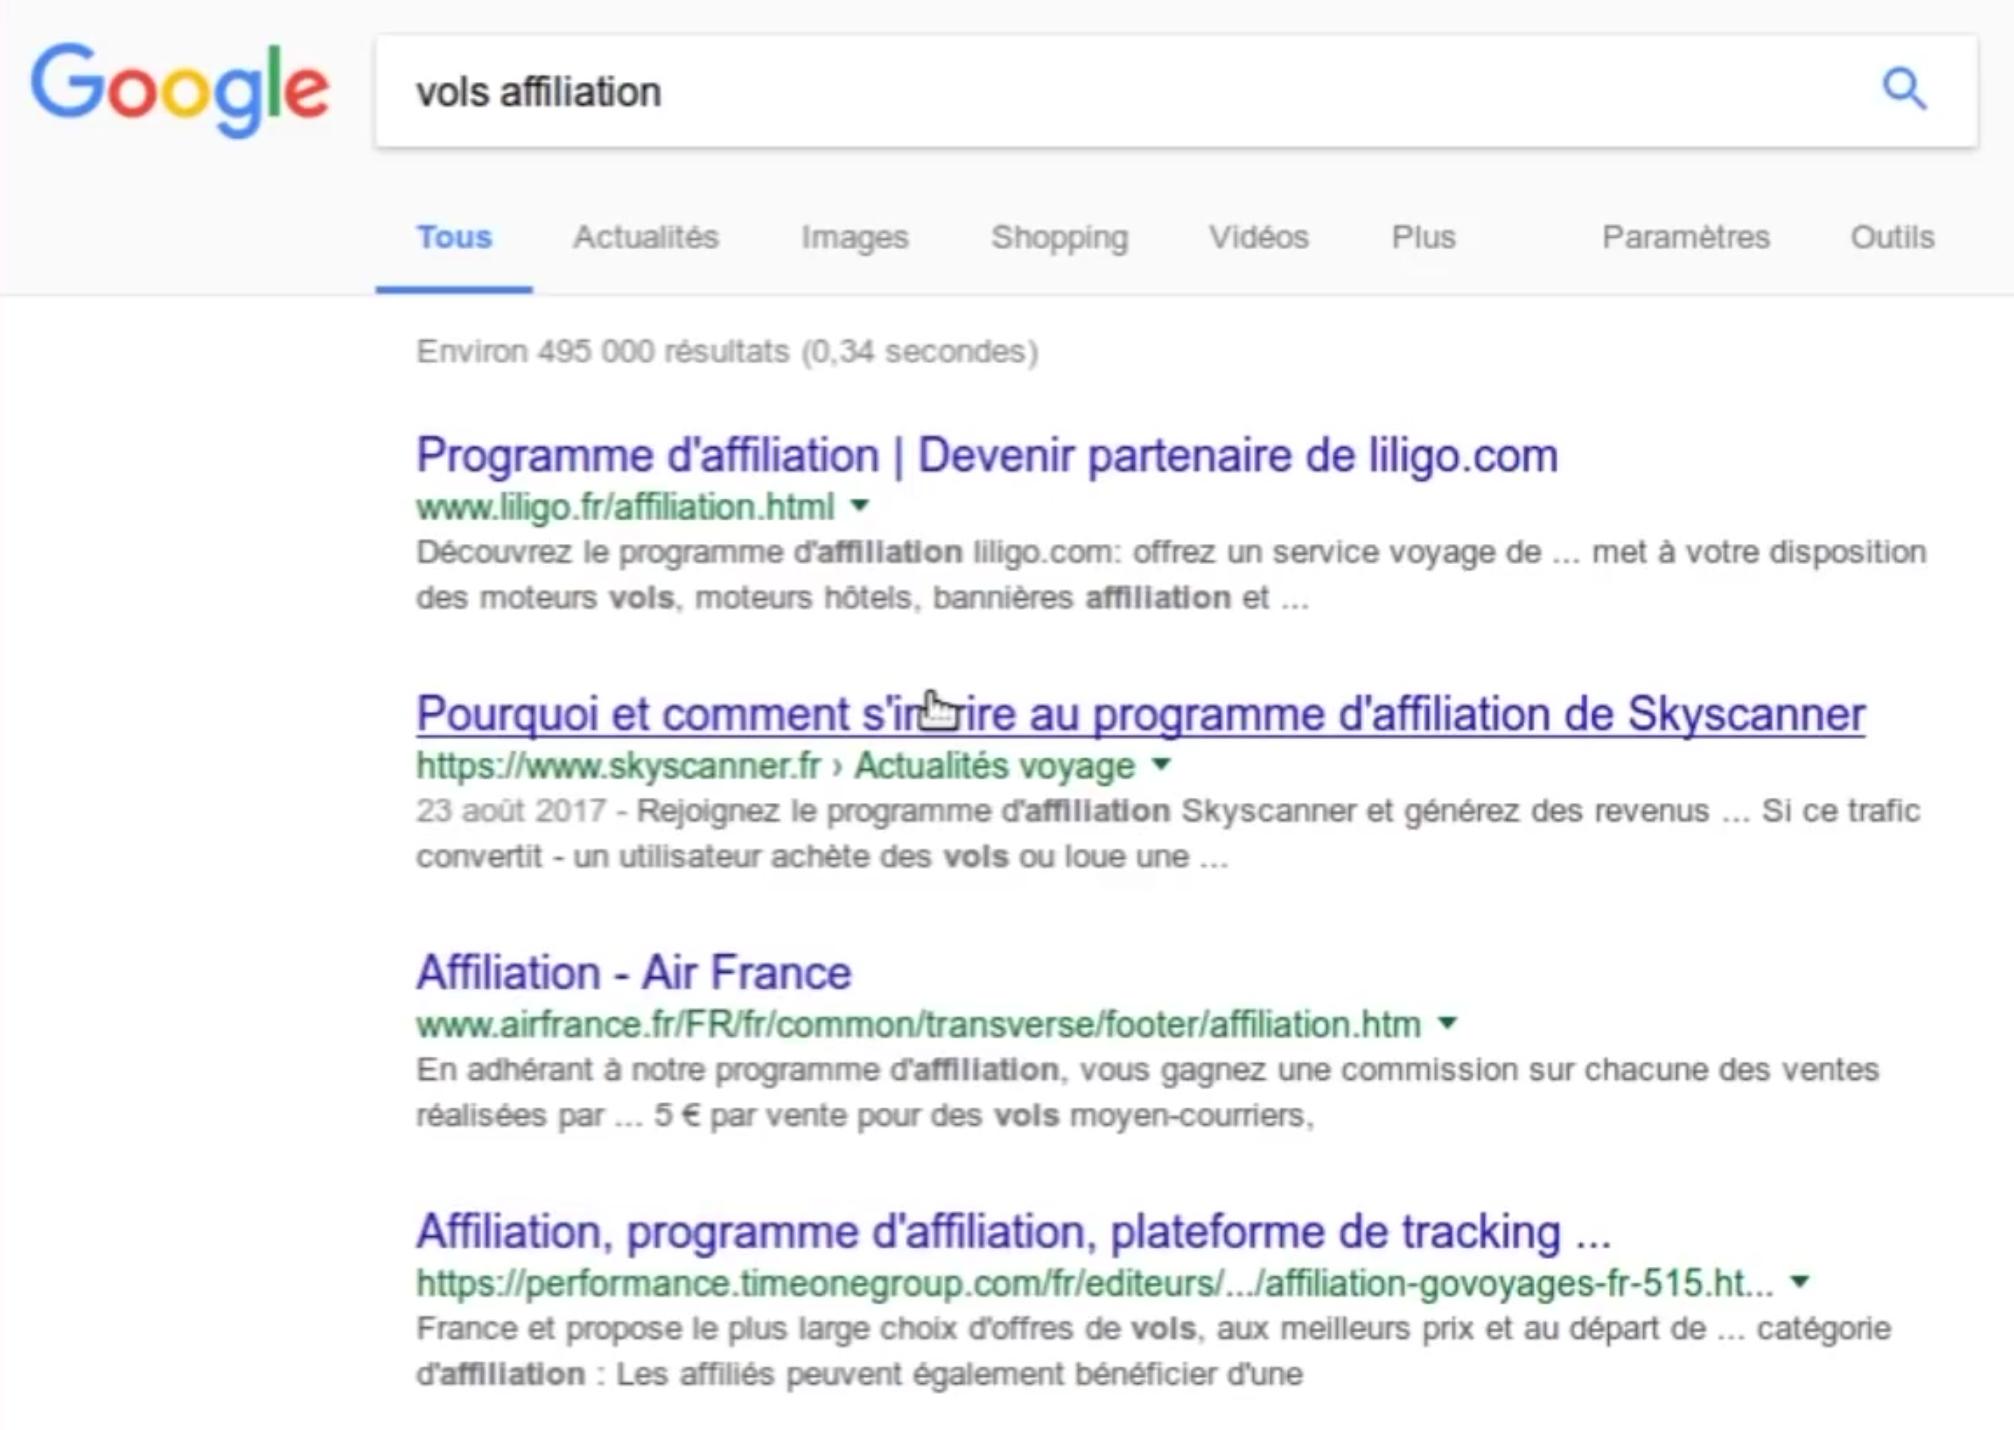 recherche google vols affiliation